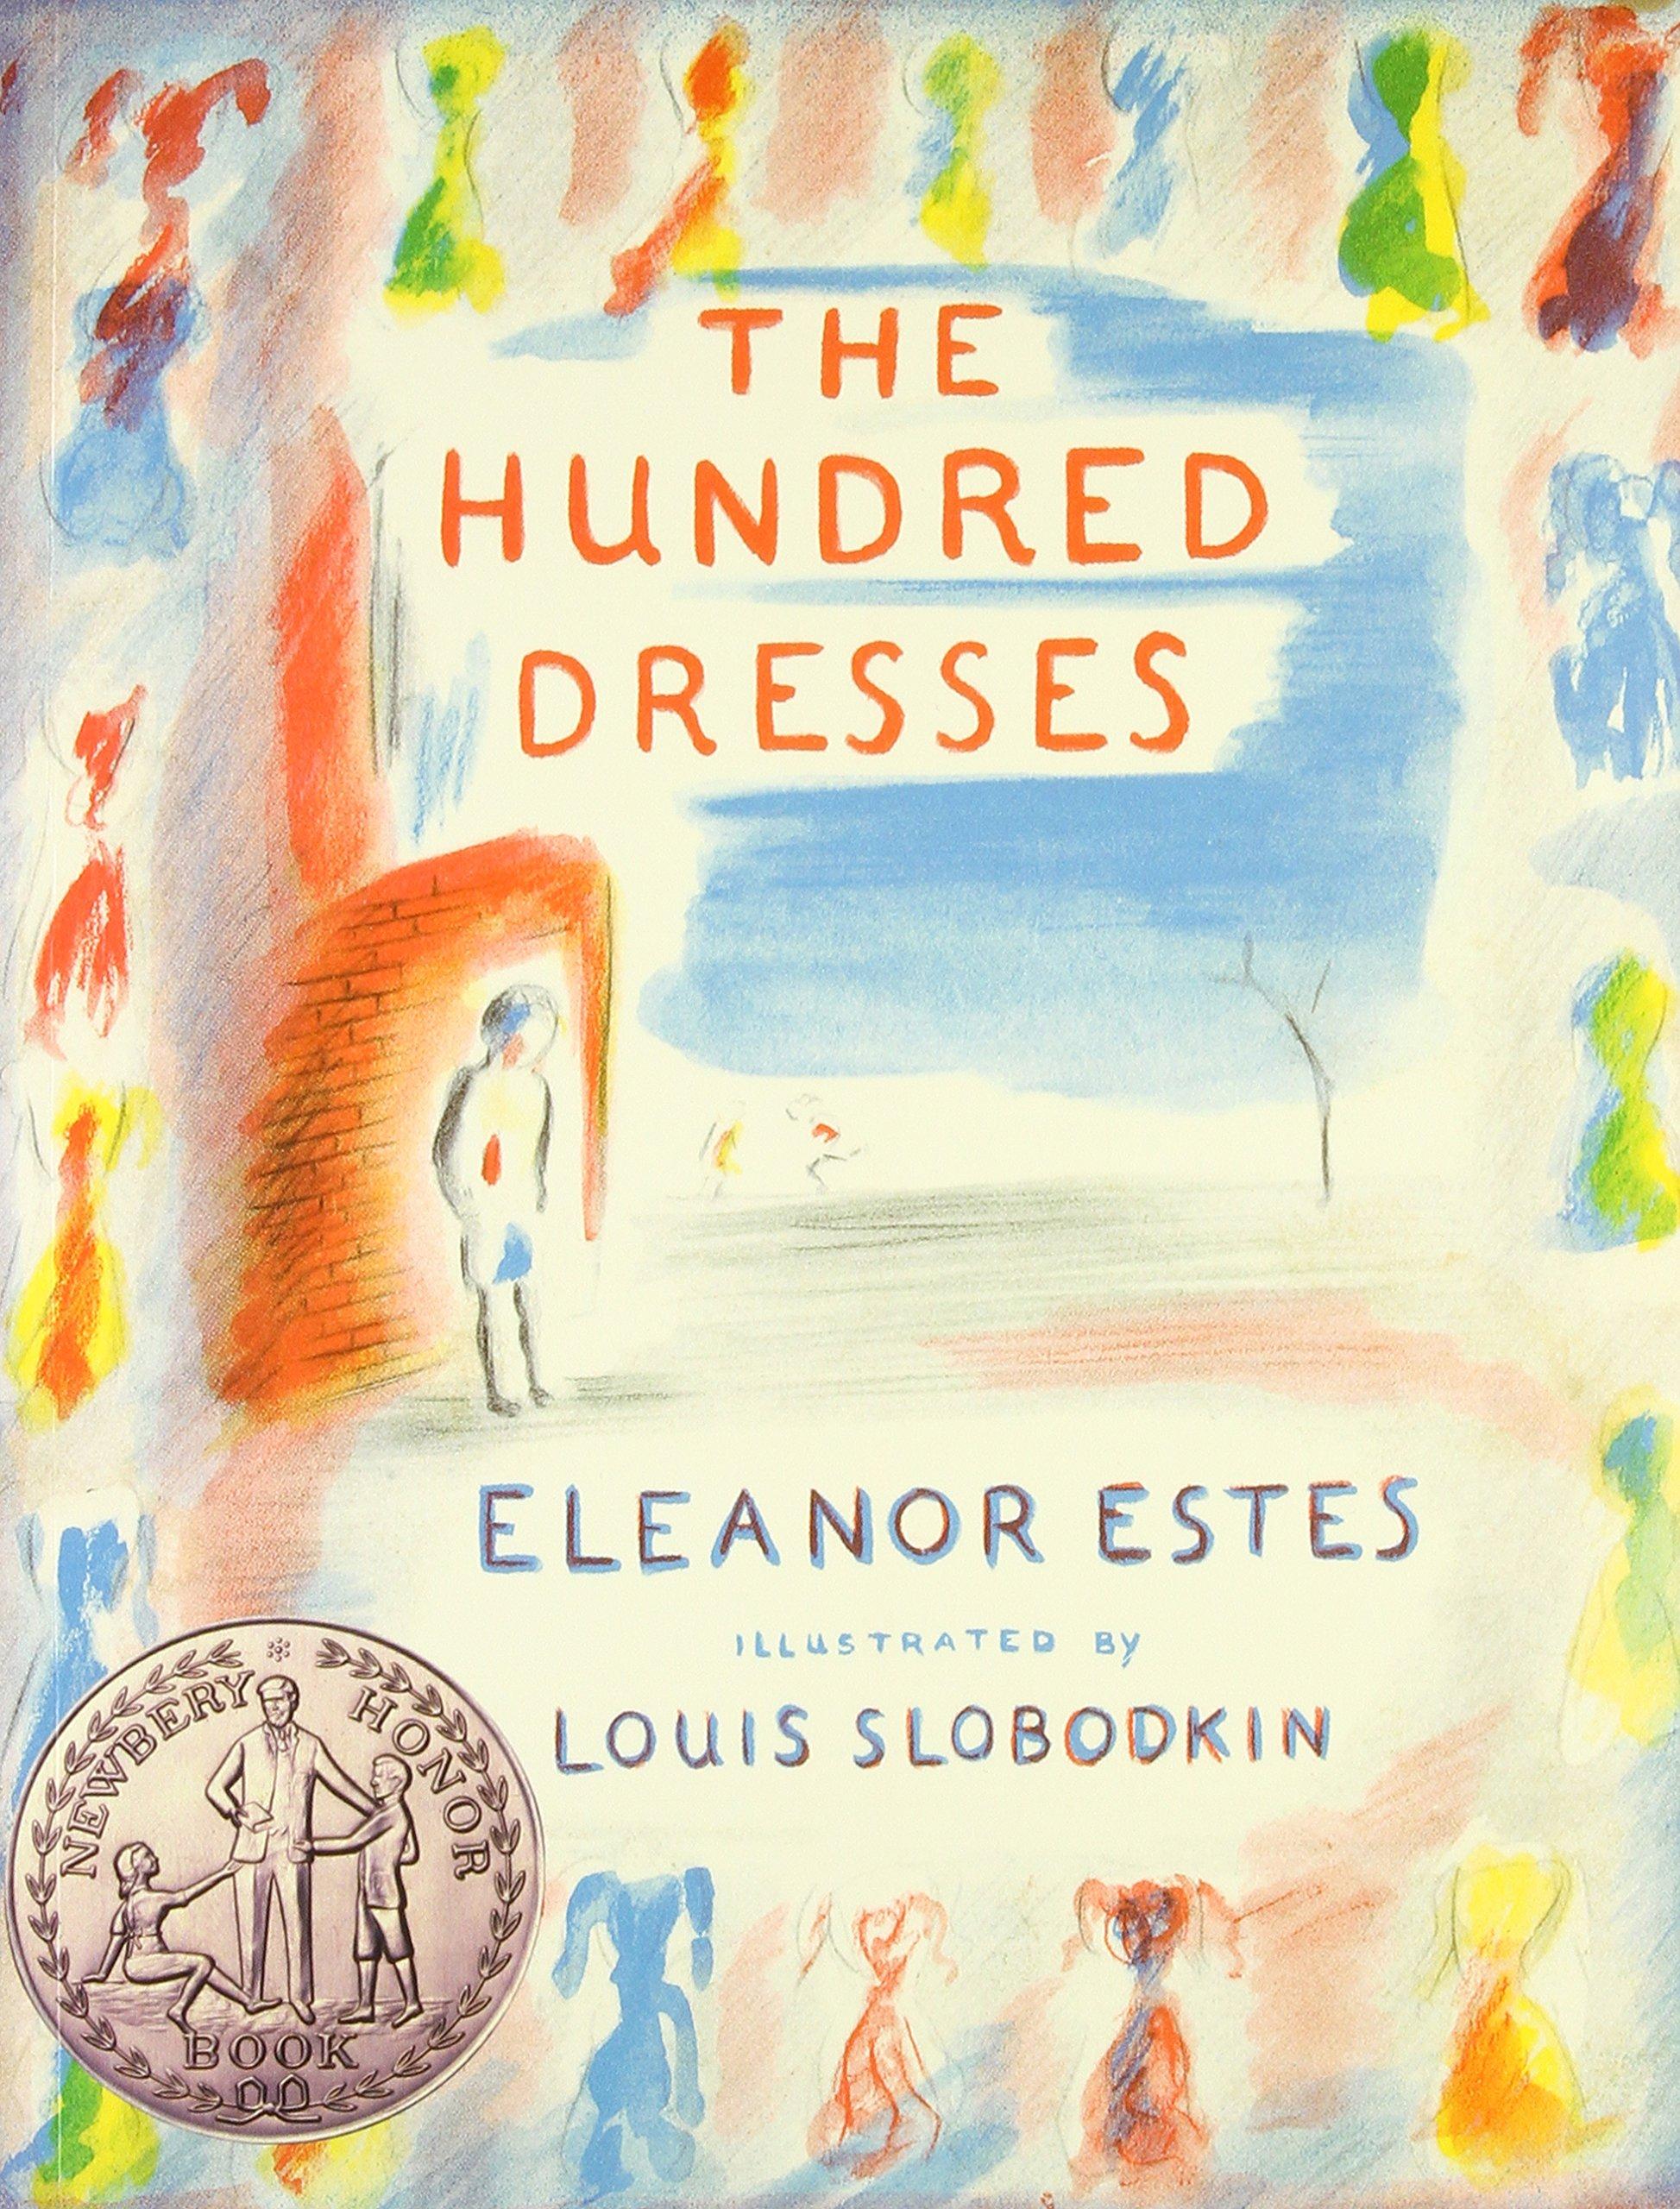 The Hundred Dresses: Amazon.es: Eleanor Estes, Louis Slobodkin: Libros en idiomas extranjeros